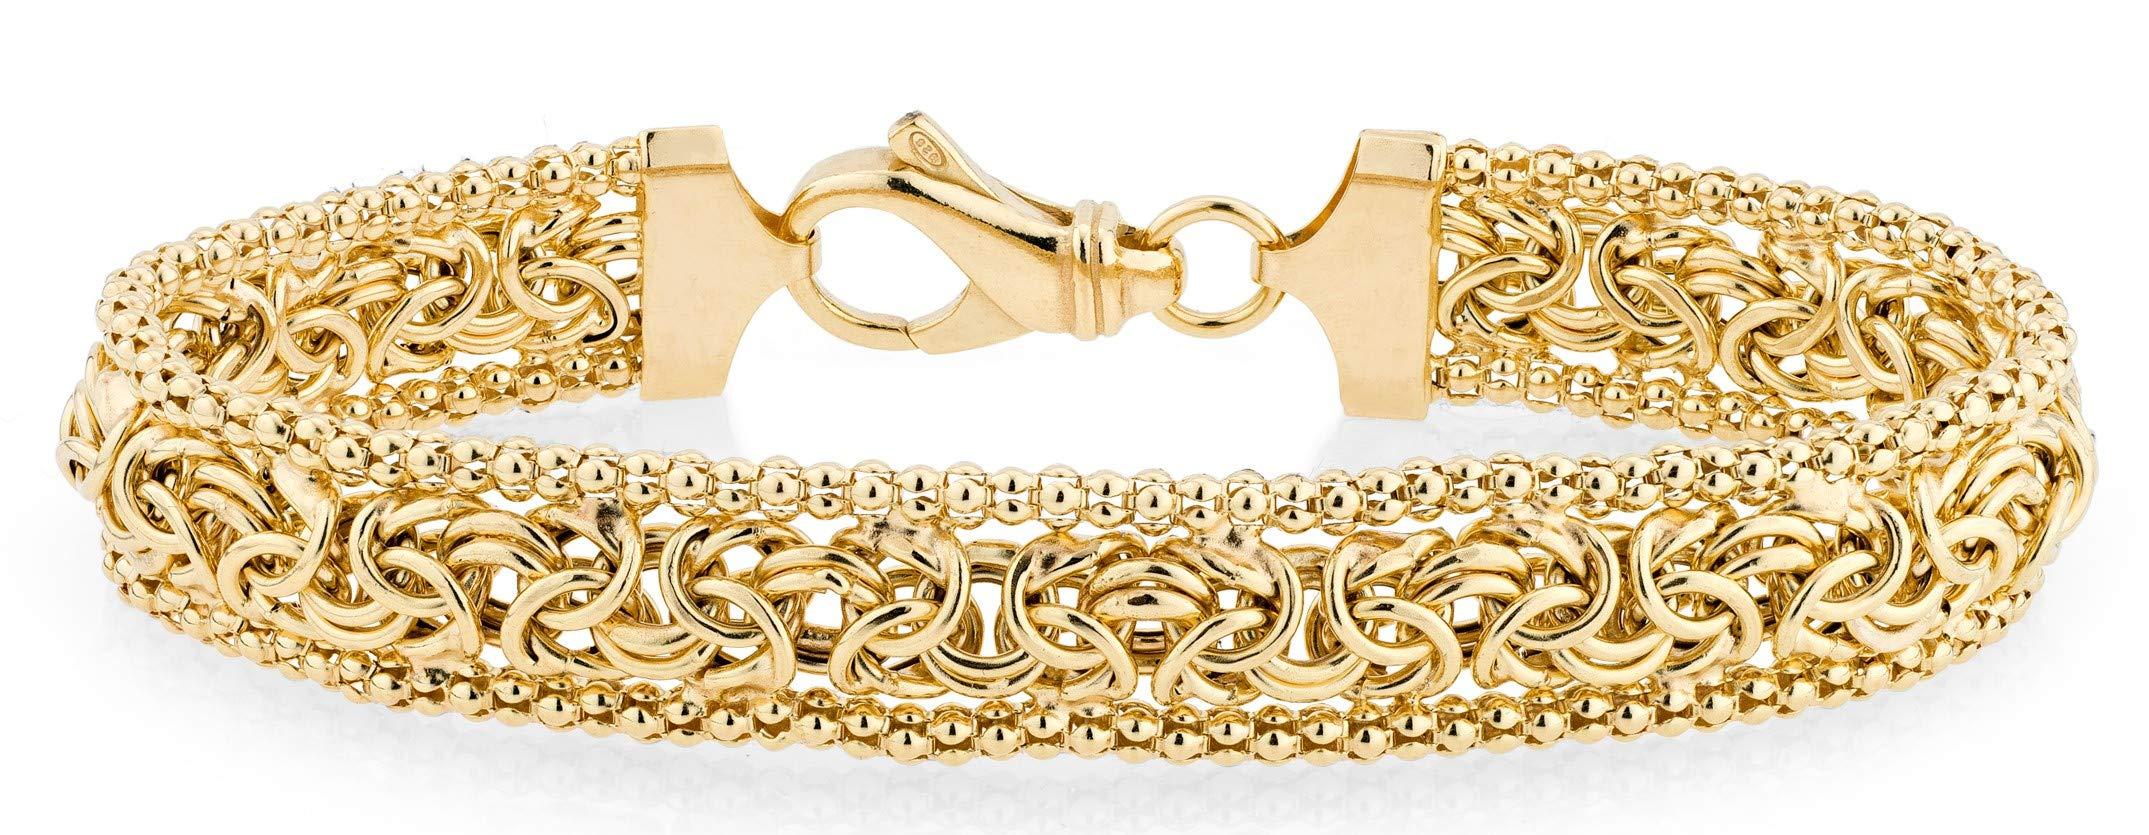 MiaBella 18K Gold Over Sterling Silver Italian Byzantine Beaded Mesh Link Chain Bracelet for Women, 7'', 7.5'', 8'' 925 Italy (7)